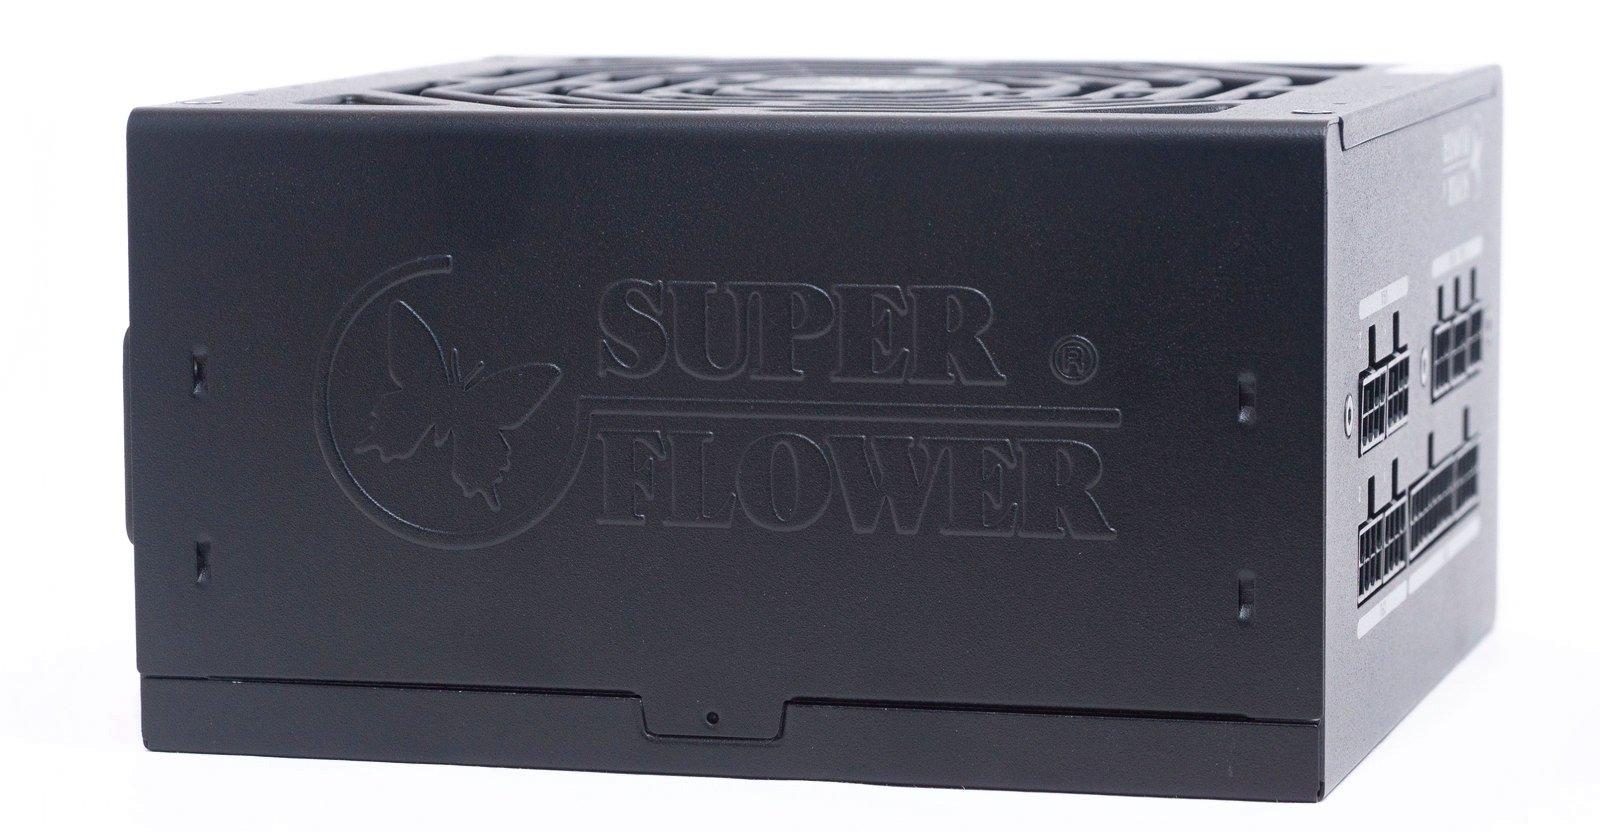 Обзор блока питания Super Flower LEADEX III Gold 750W